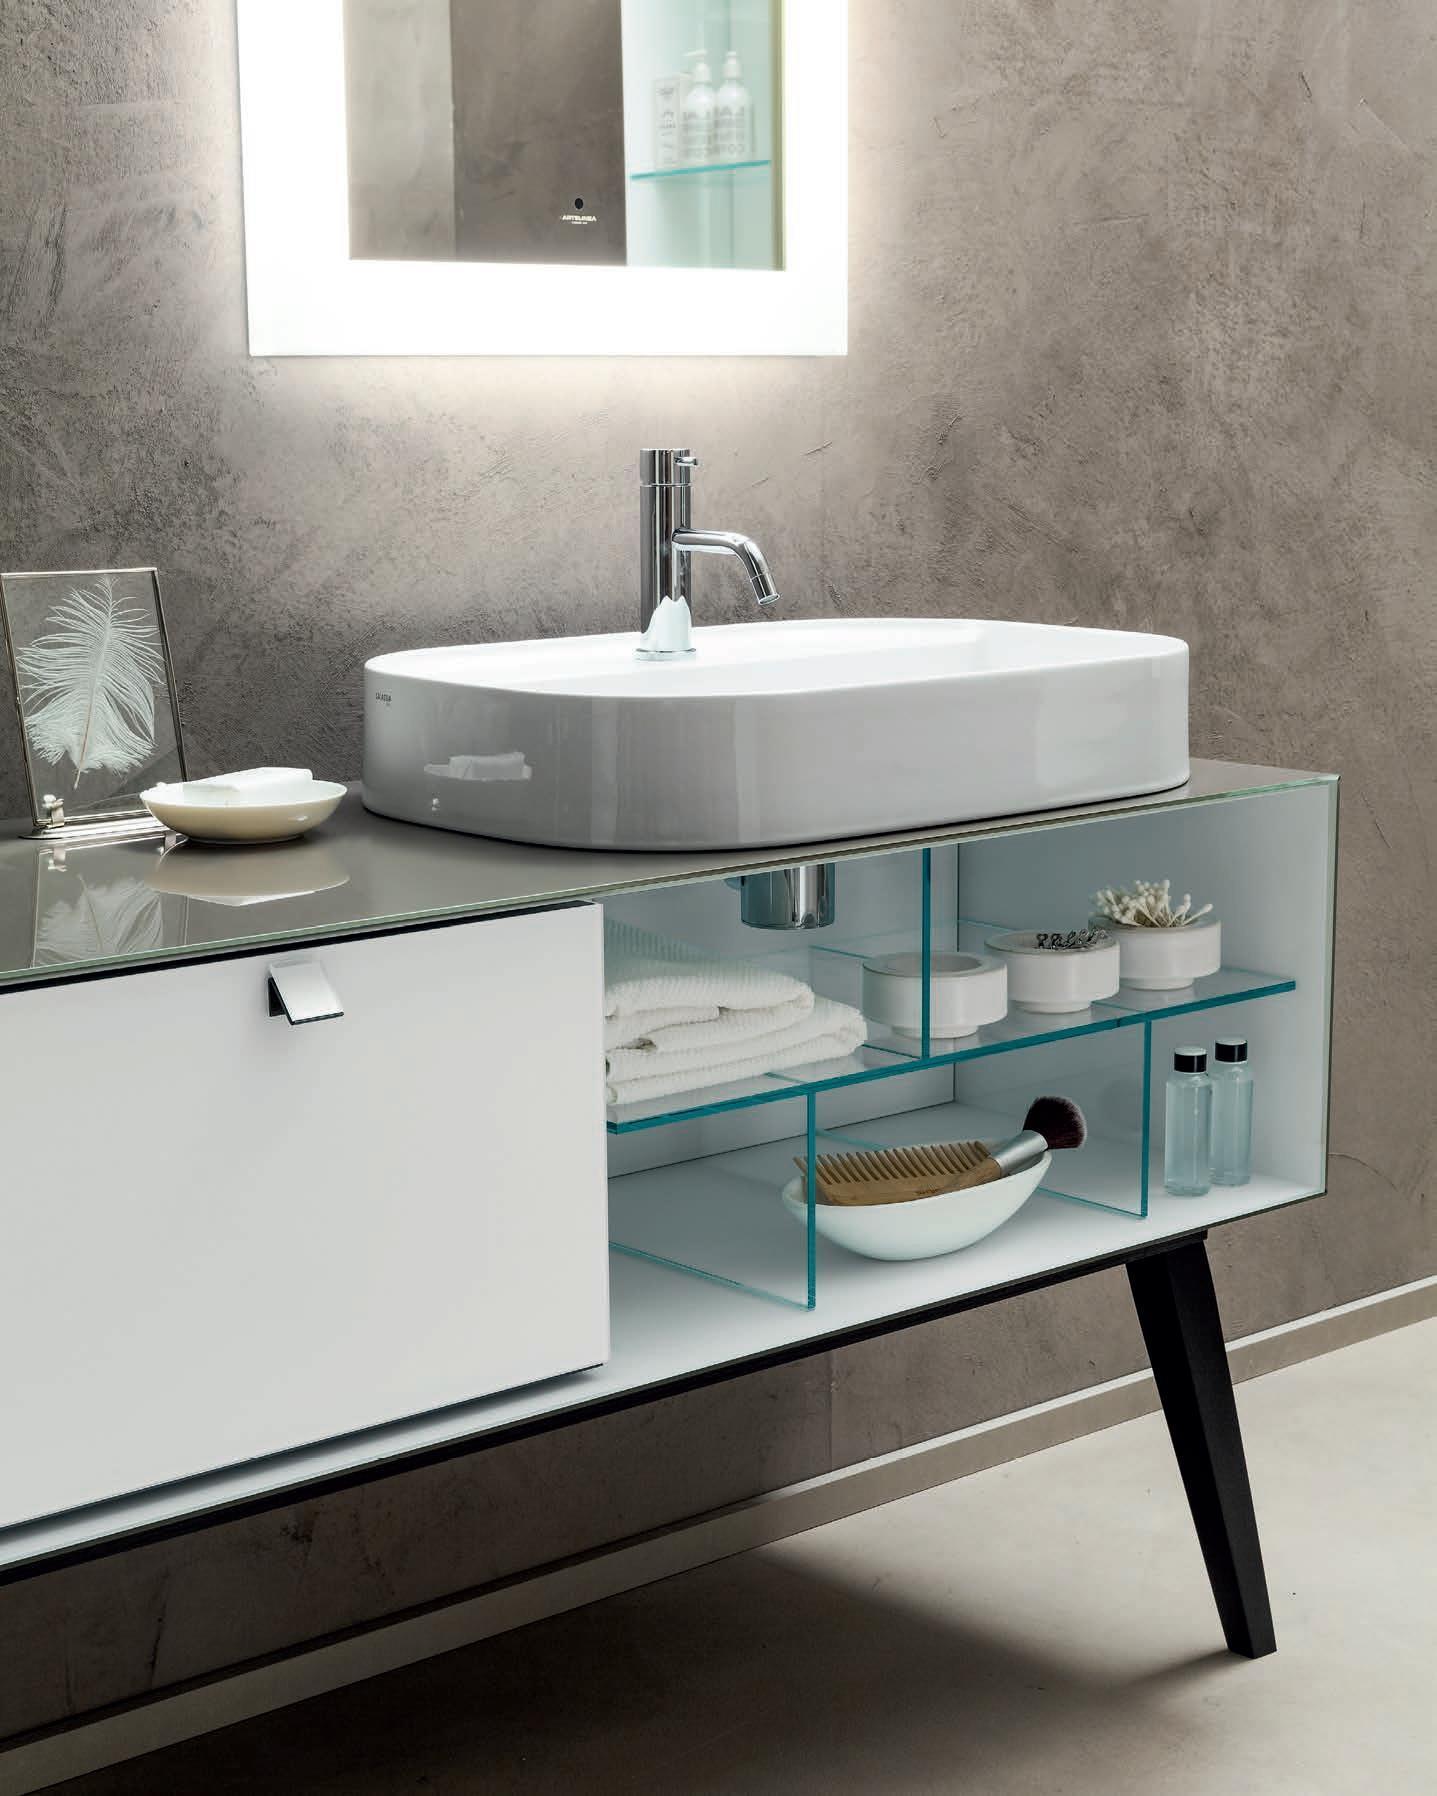 Sanitari arredo bagno alto adige dama mobili da bagno di vetro di artelinea - Mobili bagno in vetro ...